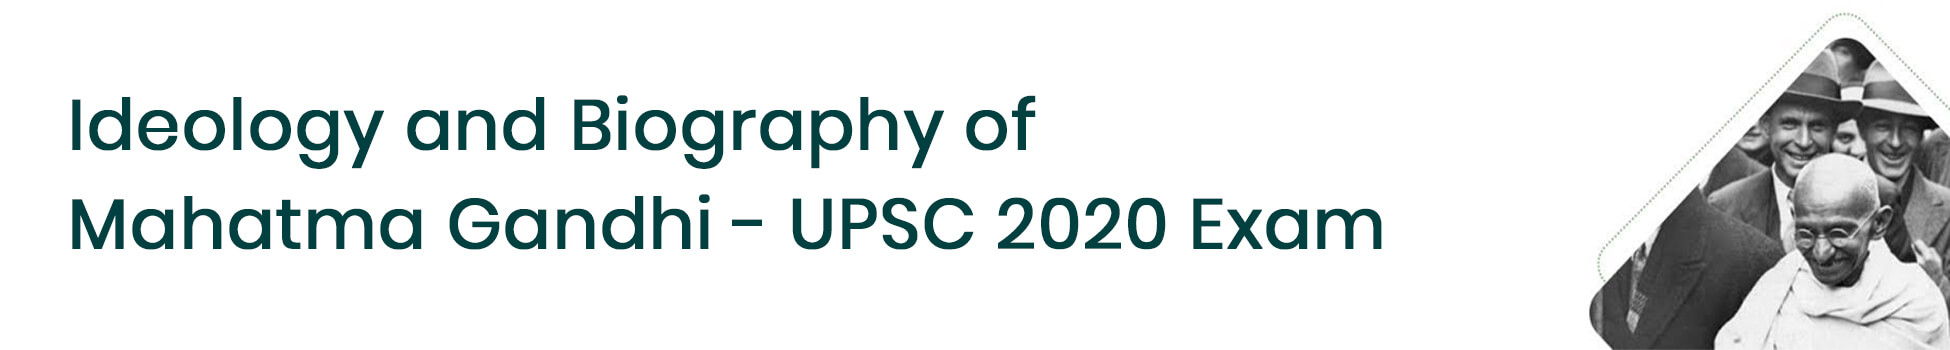 Ideology and Biography of  Mahatma Gandhi - UPSC 2020 Exam